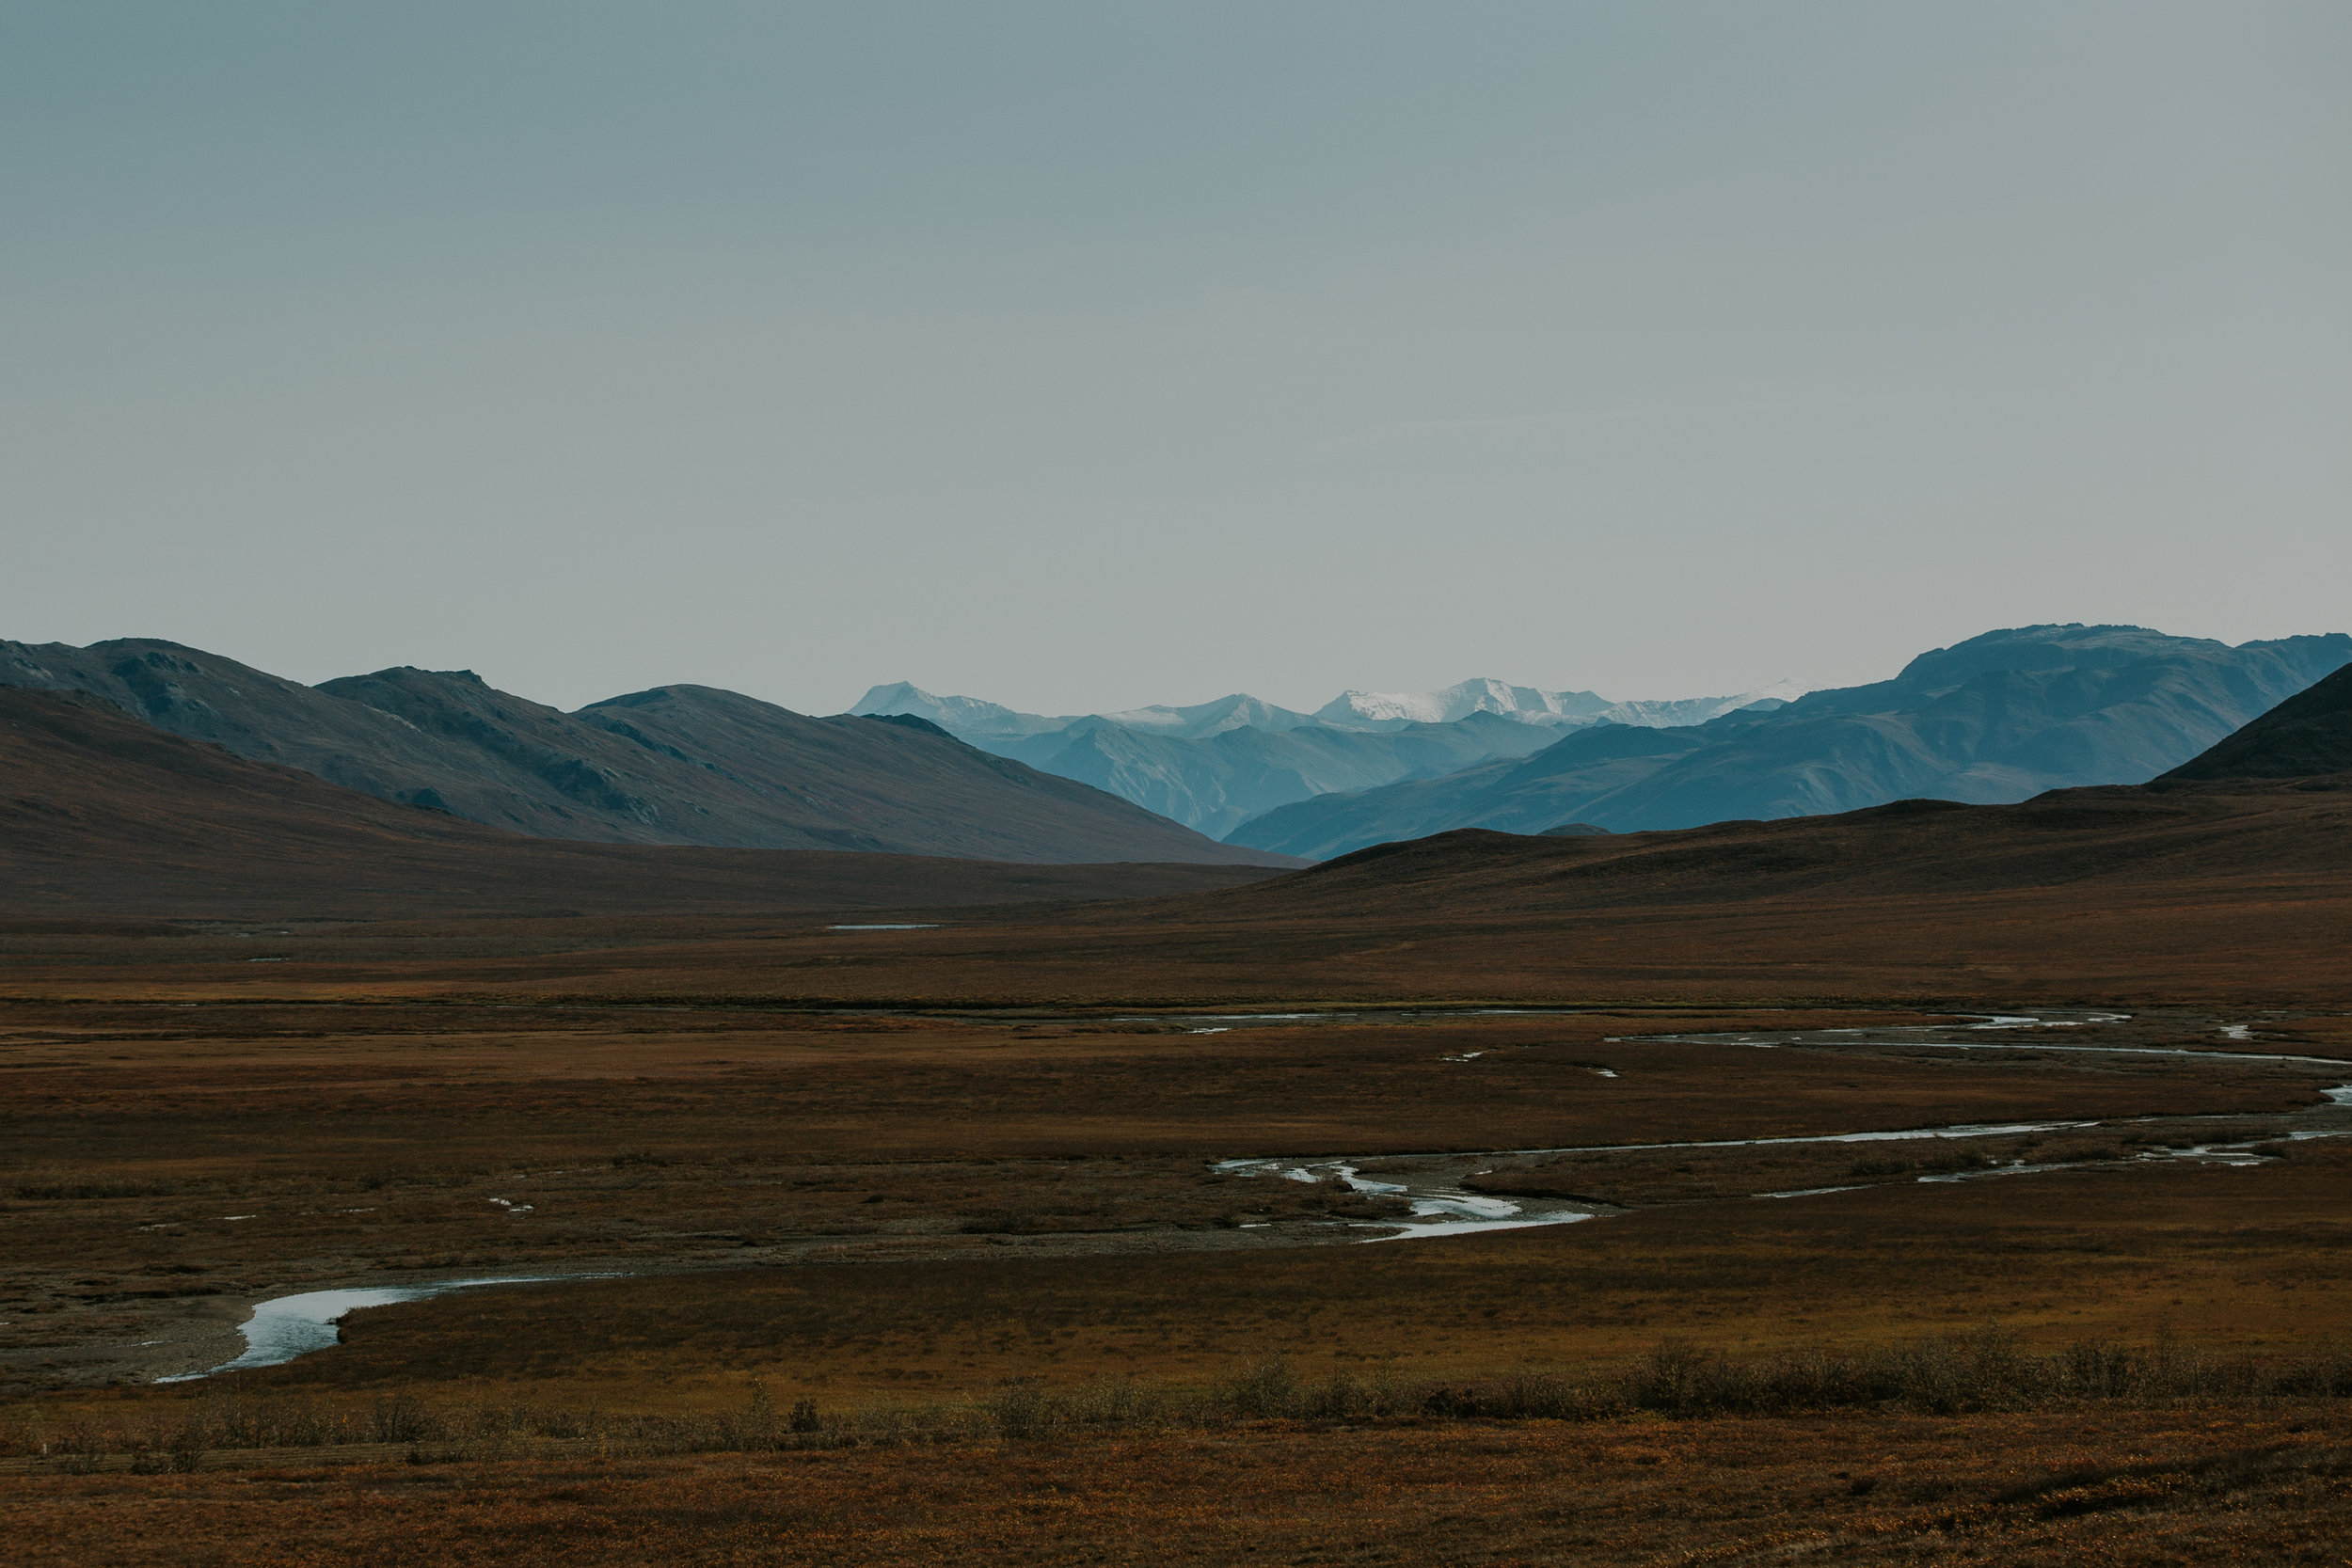 CindyGiovagnoli_Alaska_KoyukukRiver_SukakpakMountain_JimRiver_ArcticCircle_fly_fishing_September-003.jpg